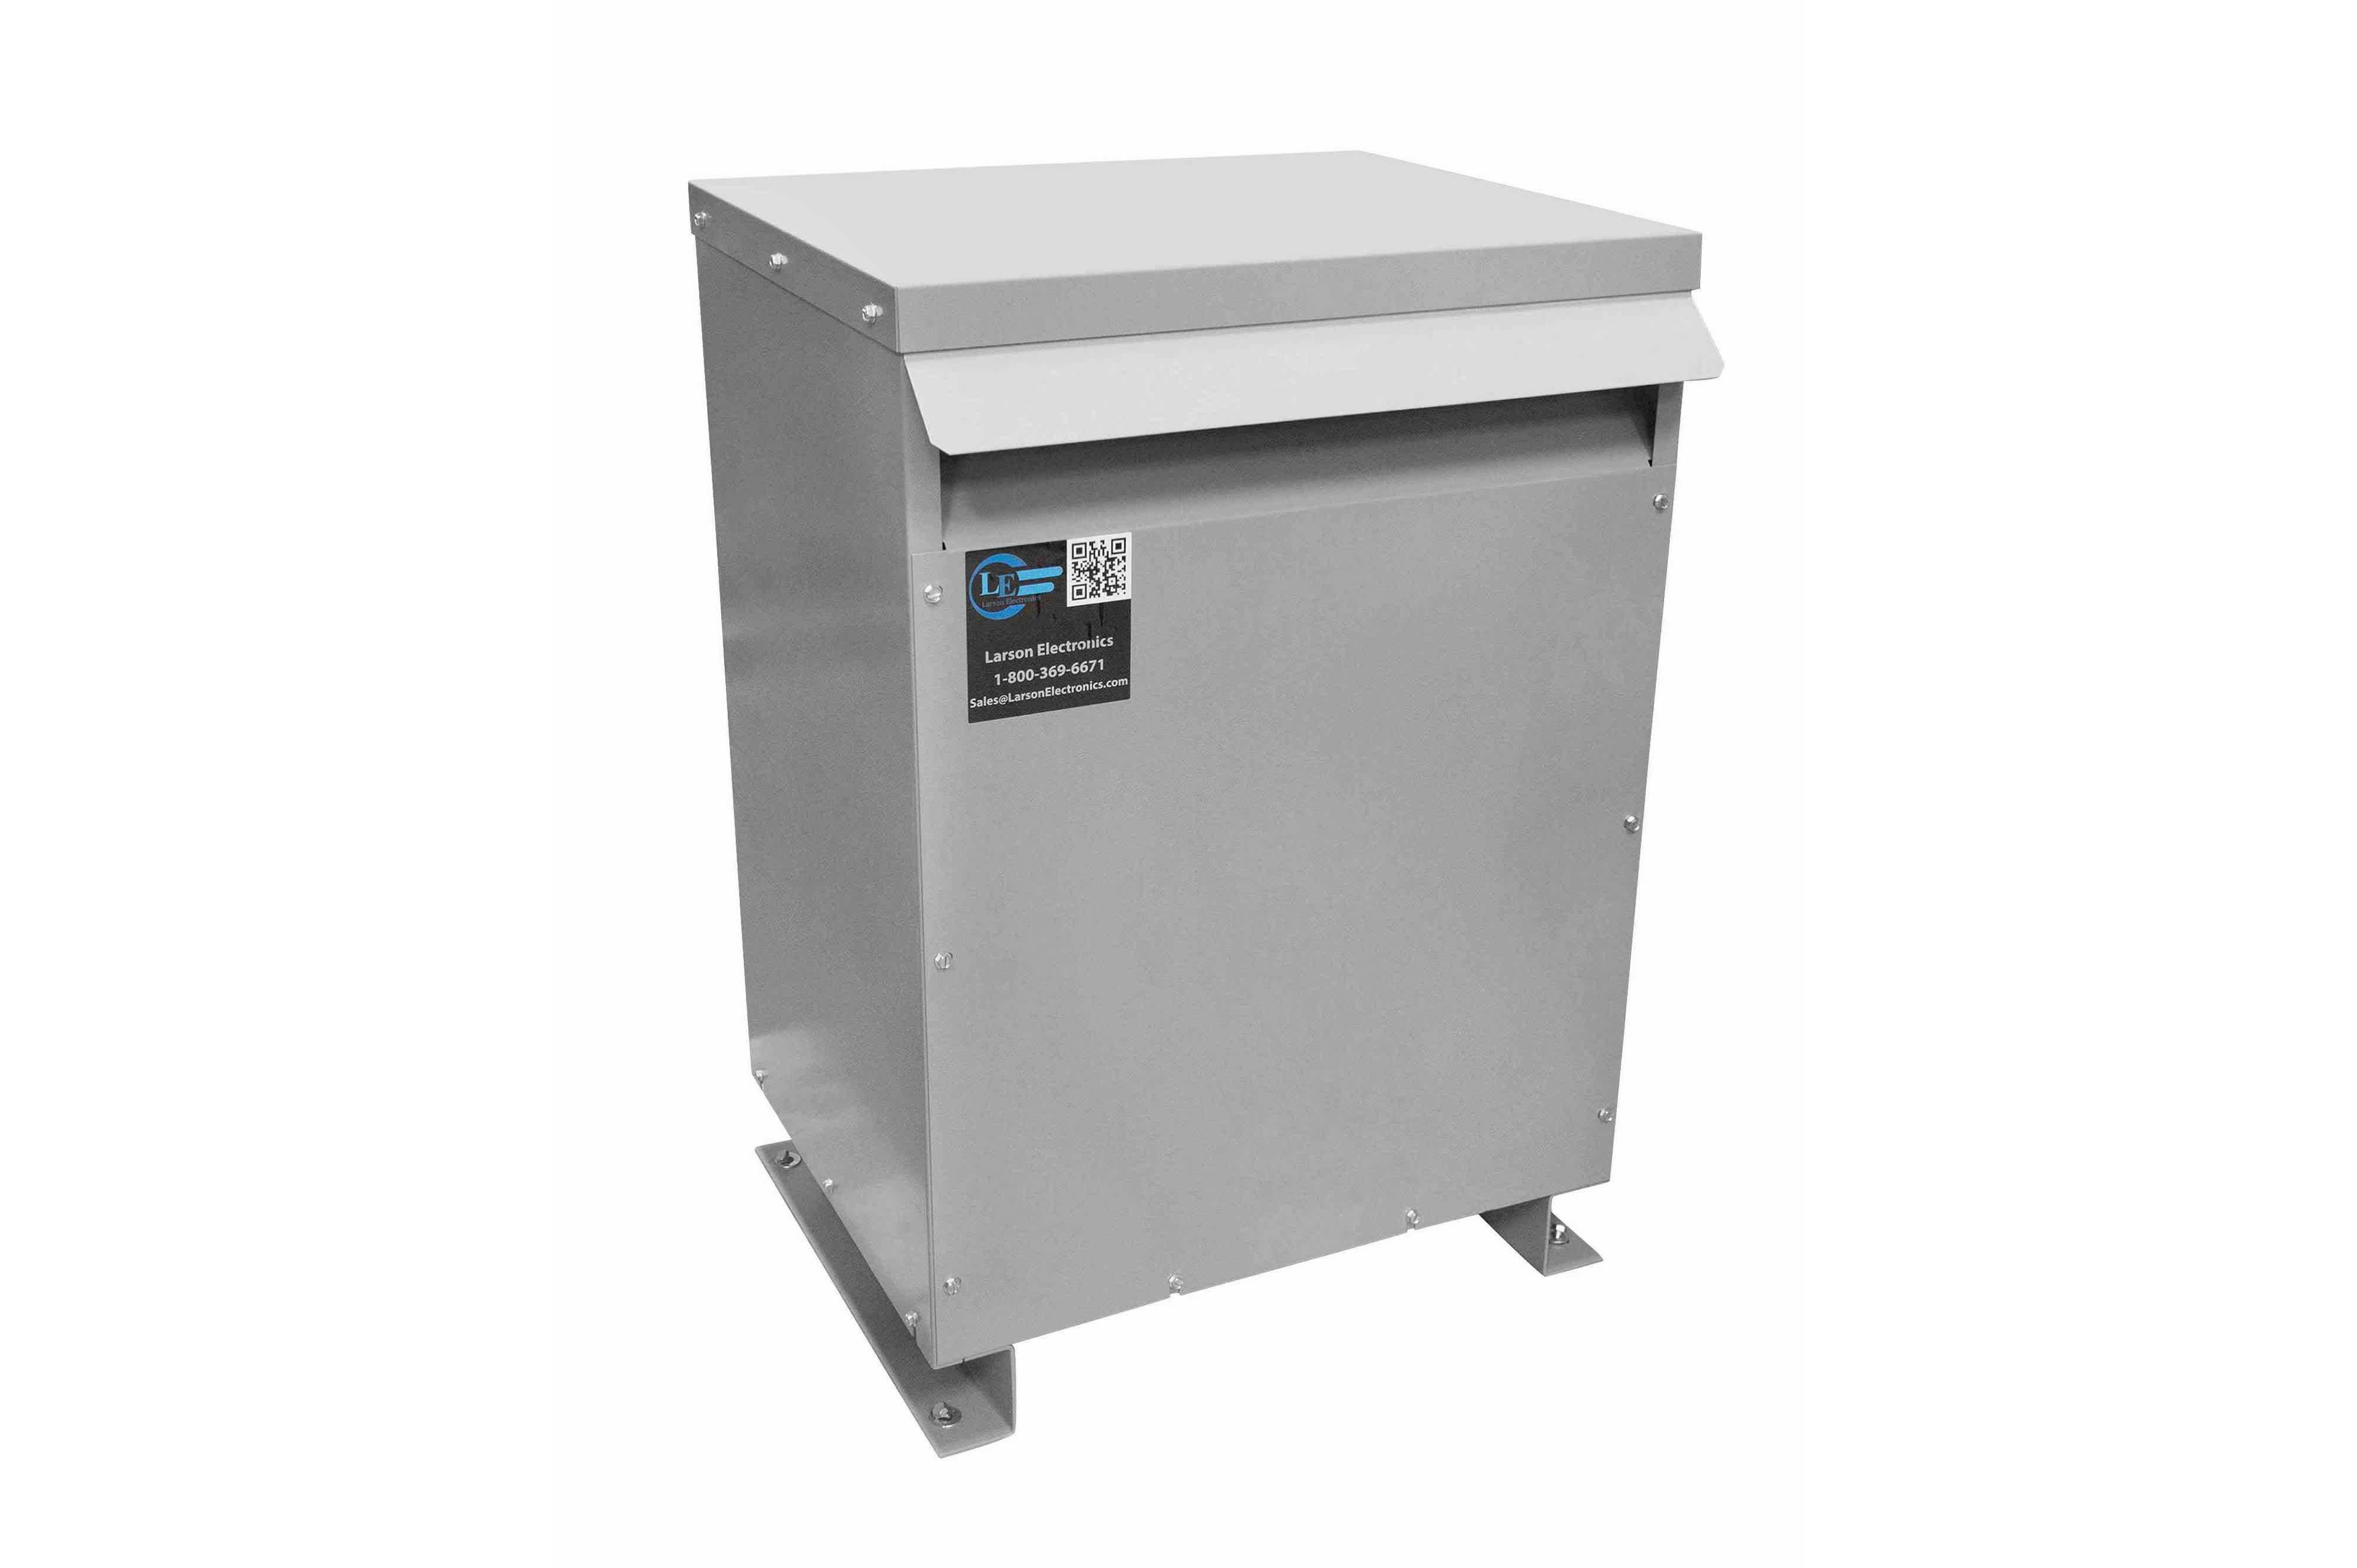 167 kVA 3PH DOE Transformer, 380V Delta Primary, 208Y/120 Wye-N Secondary, N3R, Ventilated, 60 Hz